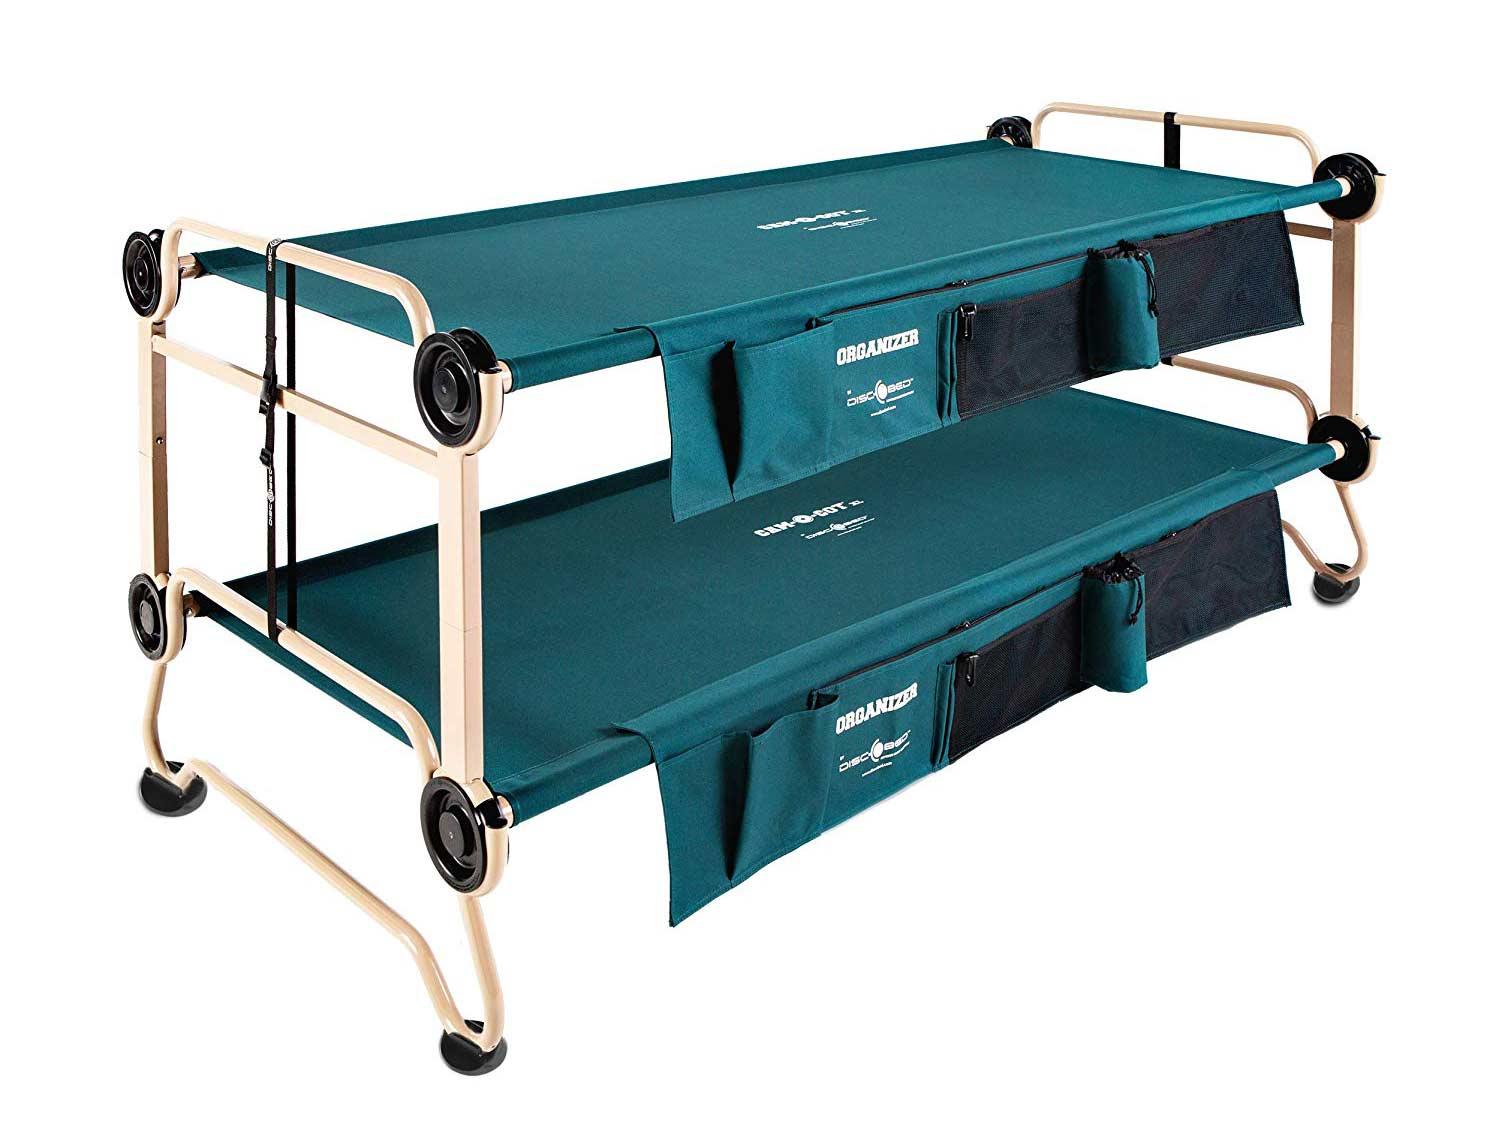 Disc-O-Bed XL bunkbed